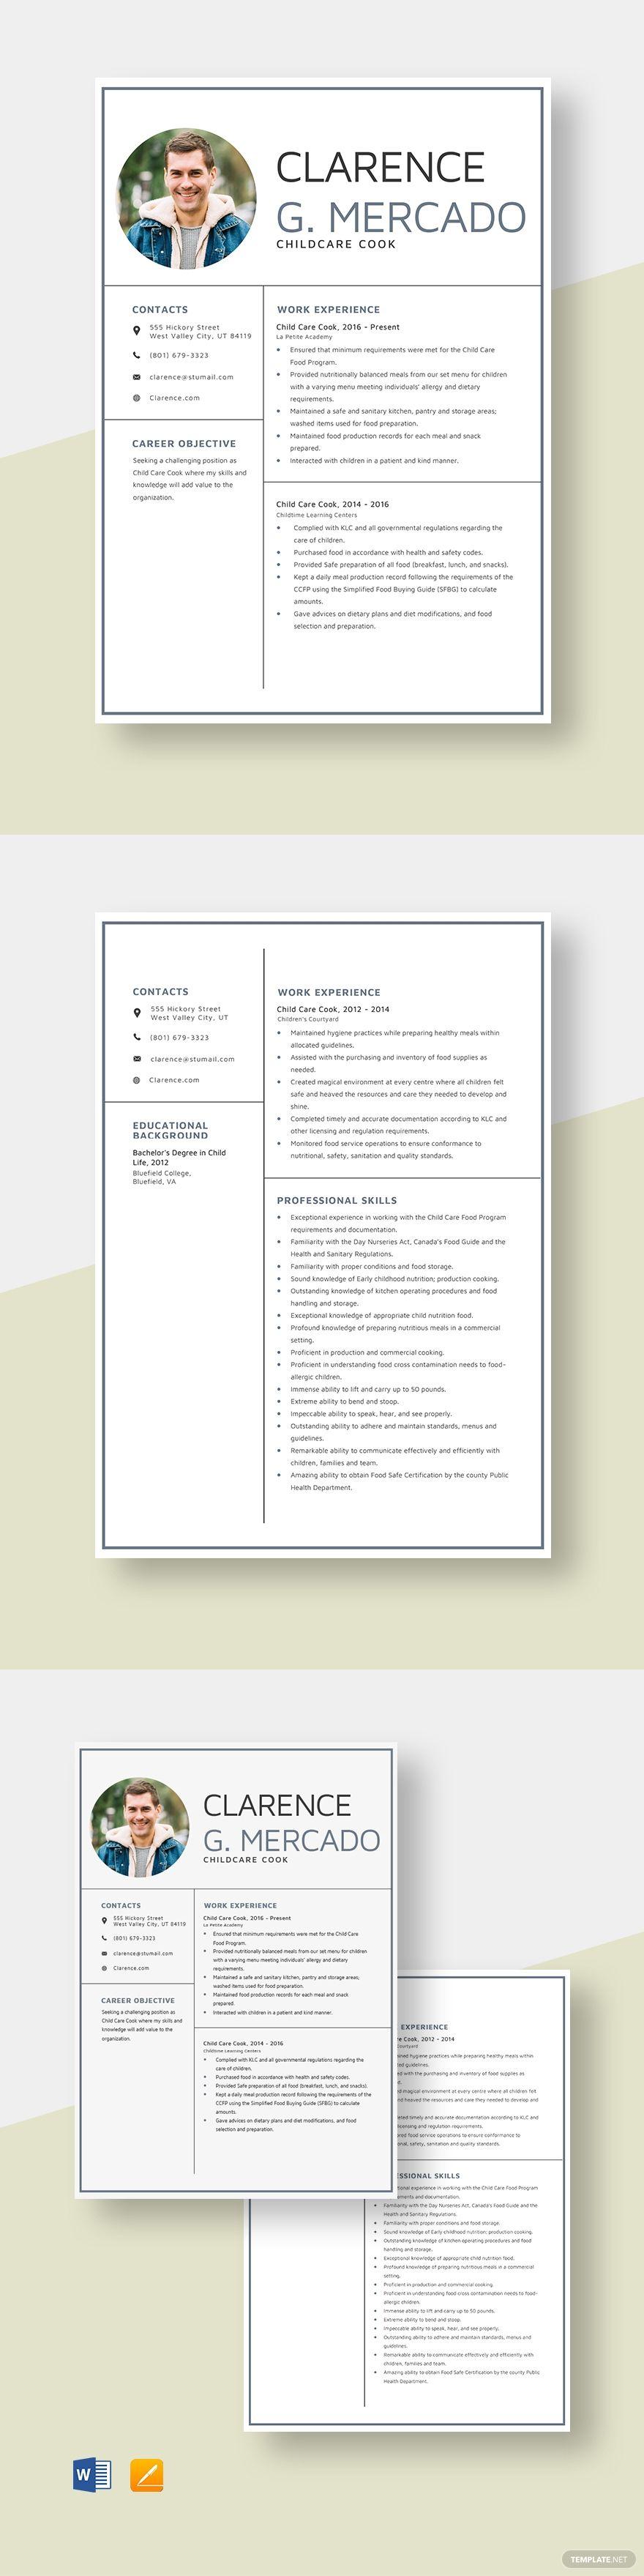 Child Care Cook Resume Template AD, , Ad, Care, Child